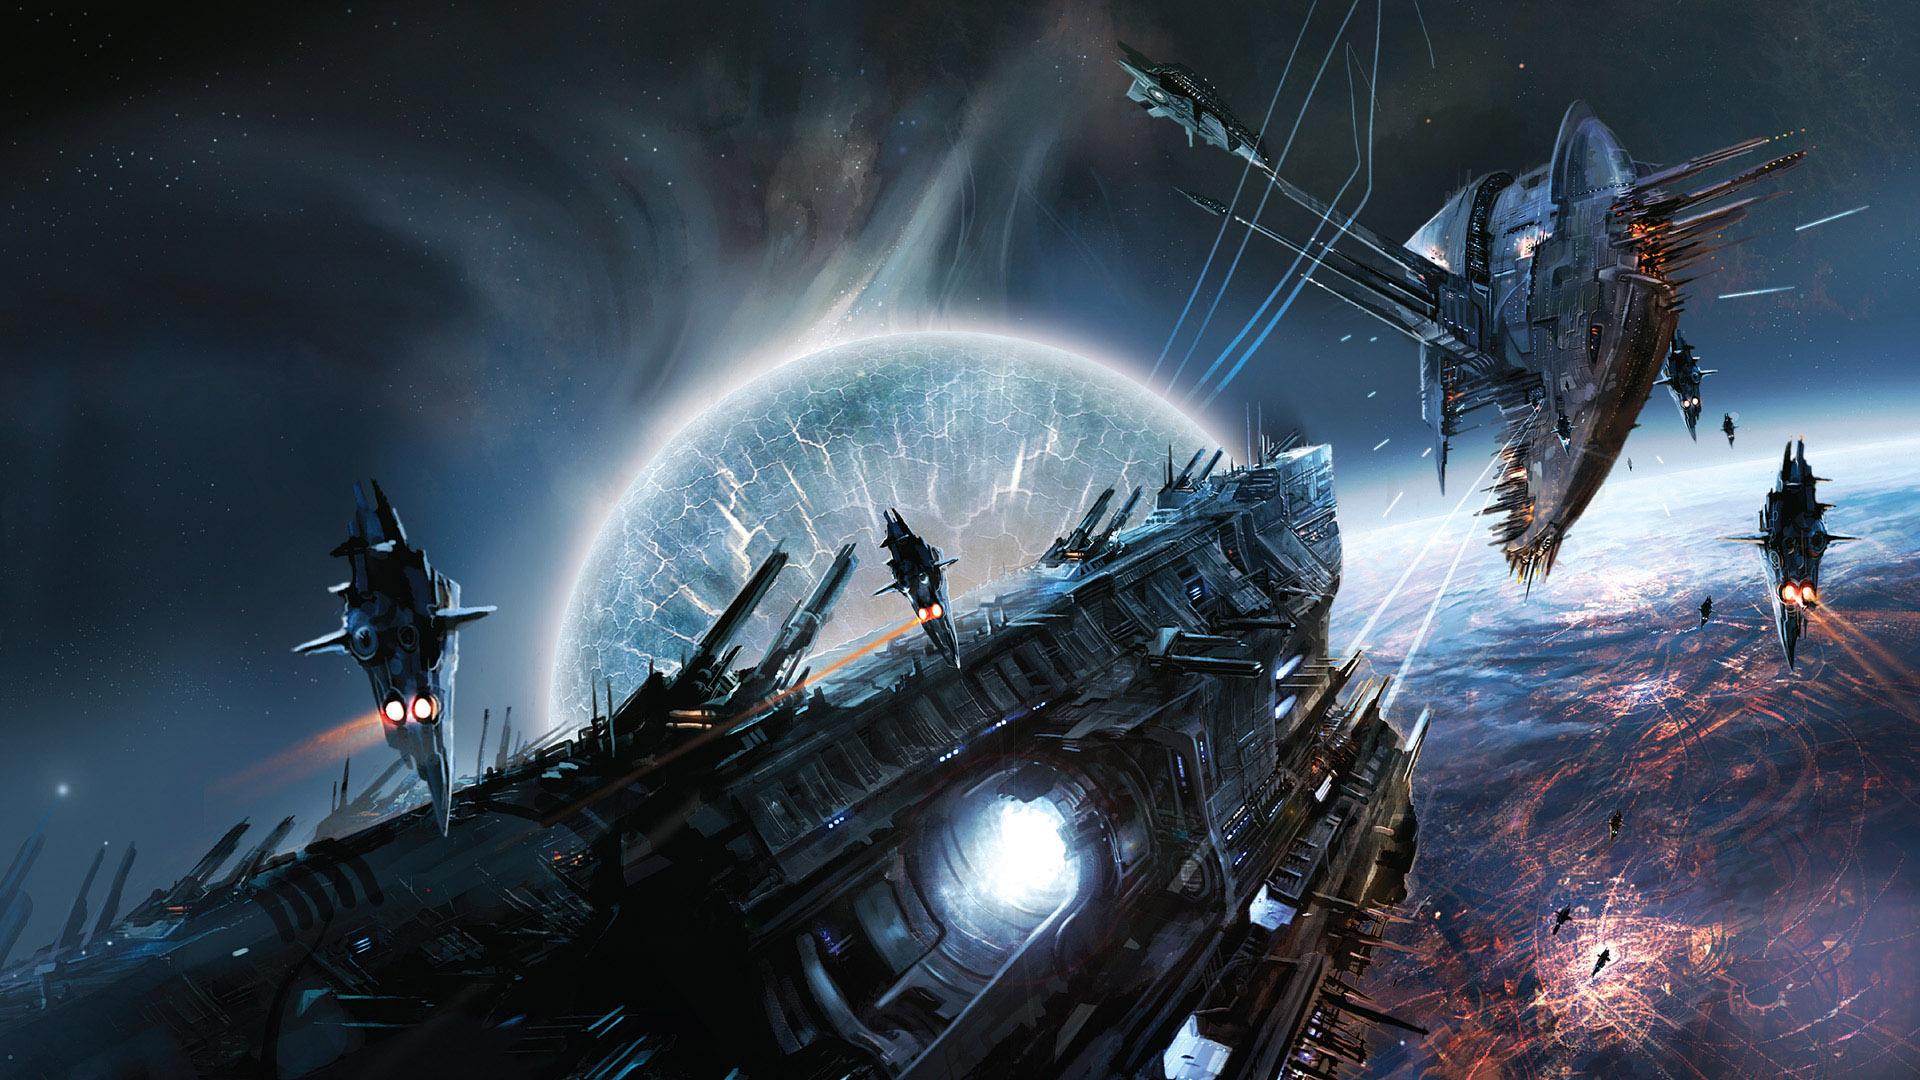 [Titan] L'expédition Lantern [PV Miracle] B8FBFED487E6BA67168718FA44C02A139789A3F6